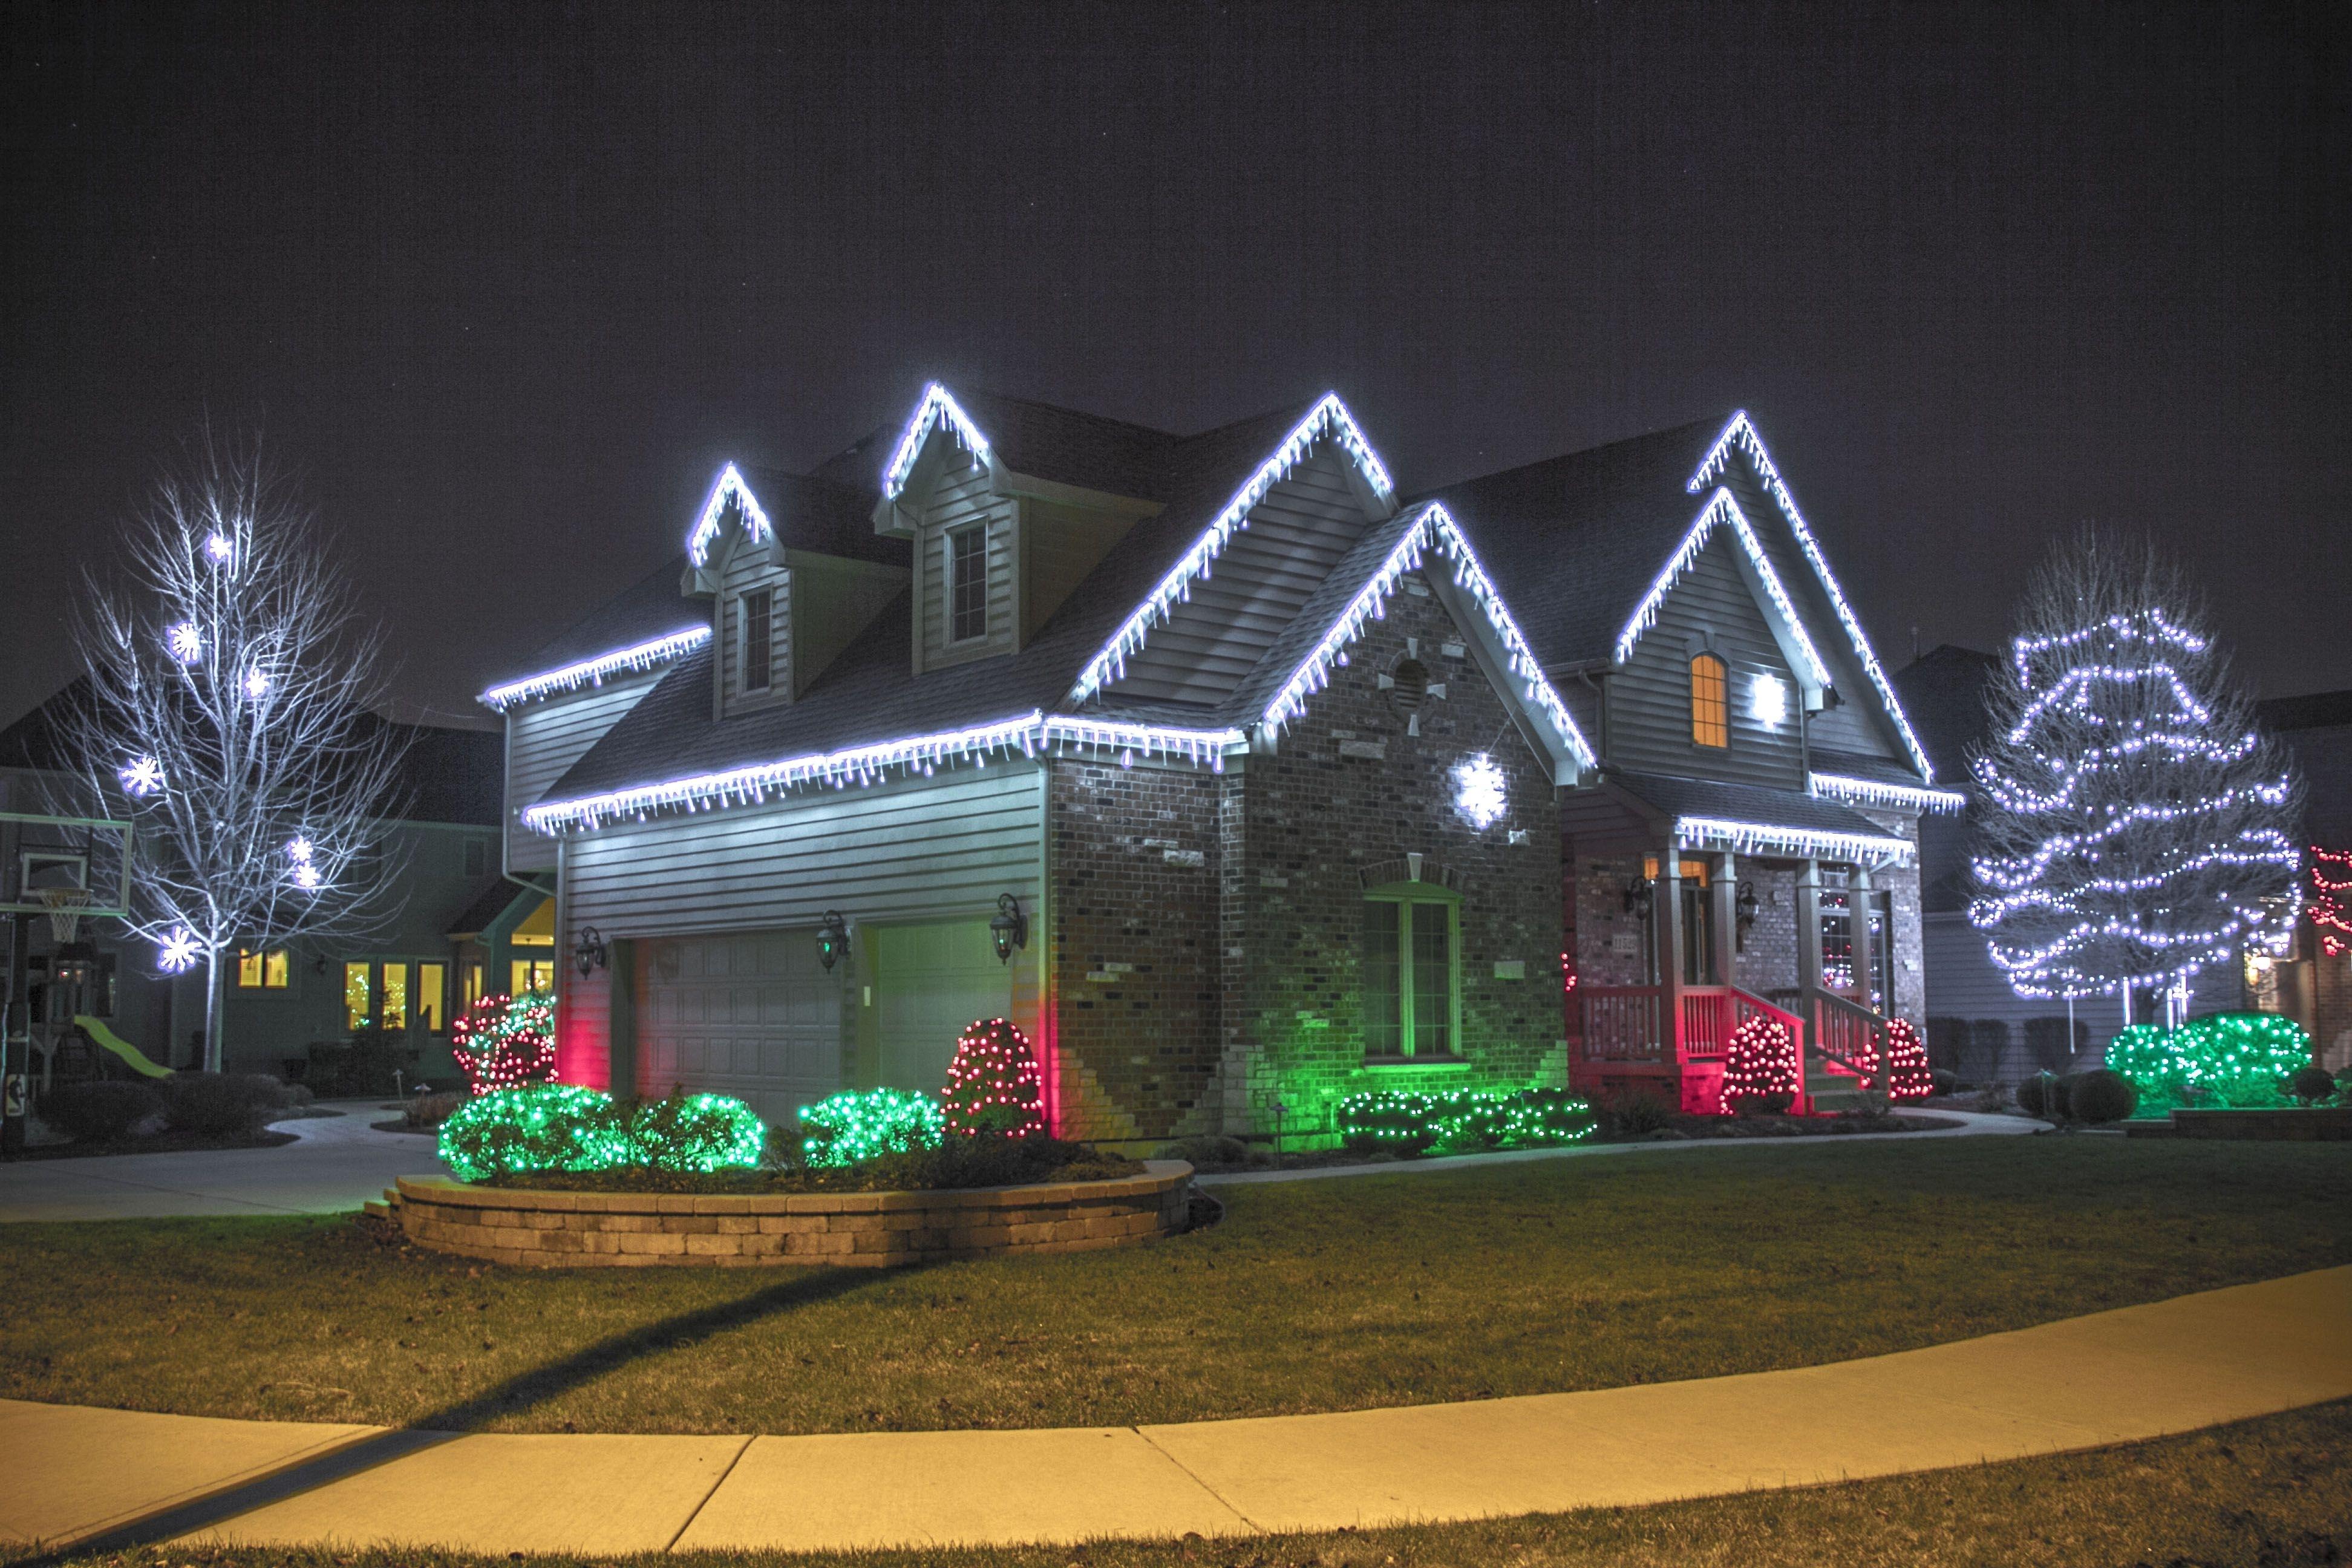 Christmas Outdoor Hanging Lights On Trees – Google Search Intended For Outdoor Hanging Lights For Christmas (#4 of 15)